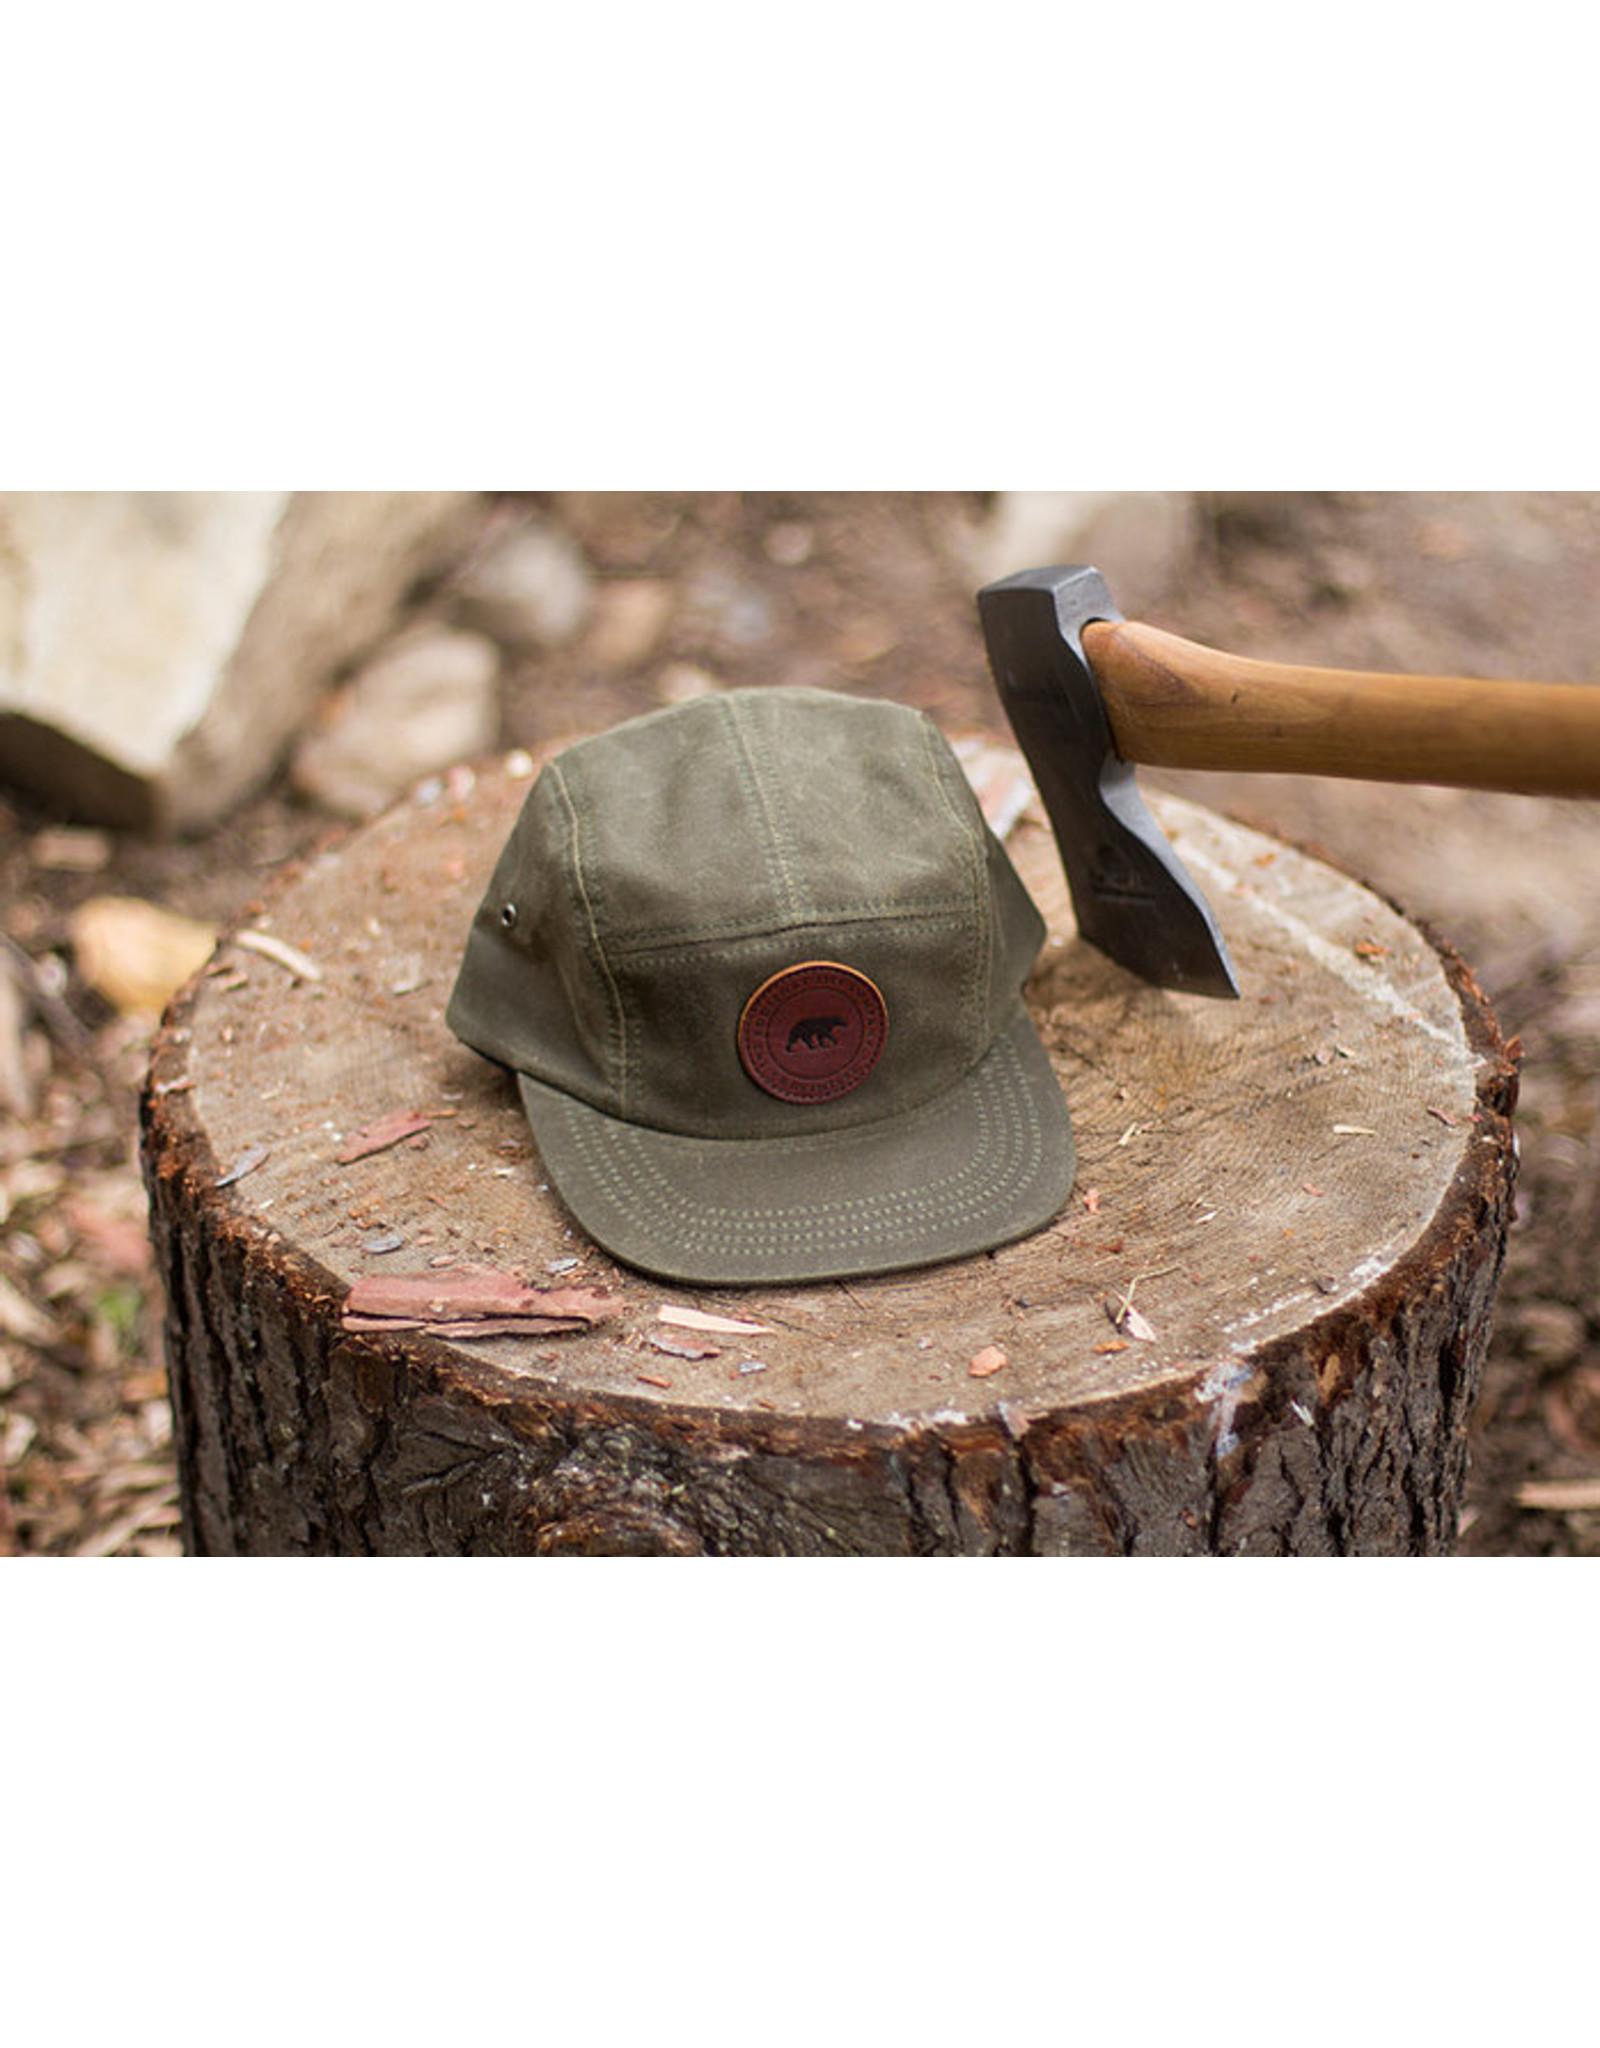 Kootenay Life Waxed Adventure Hat